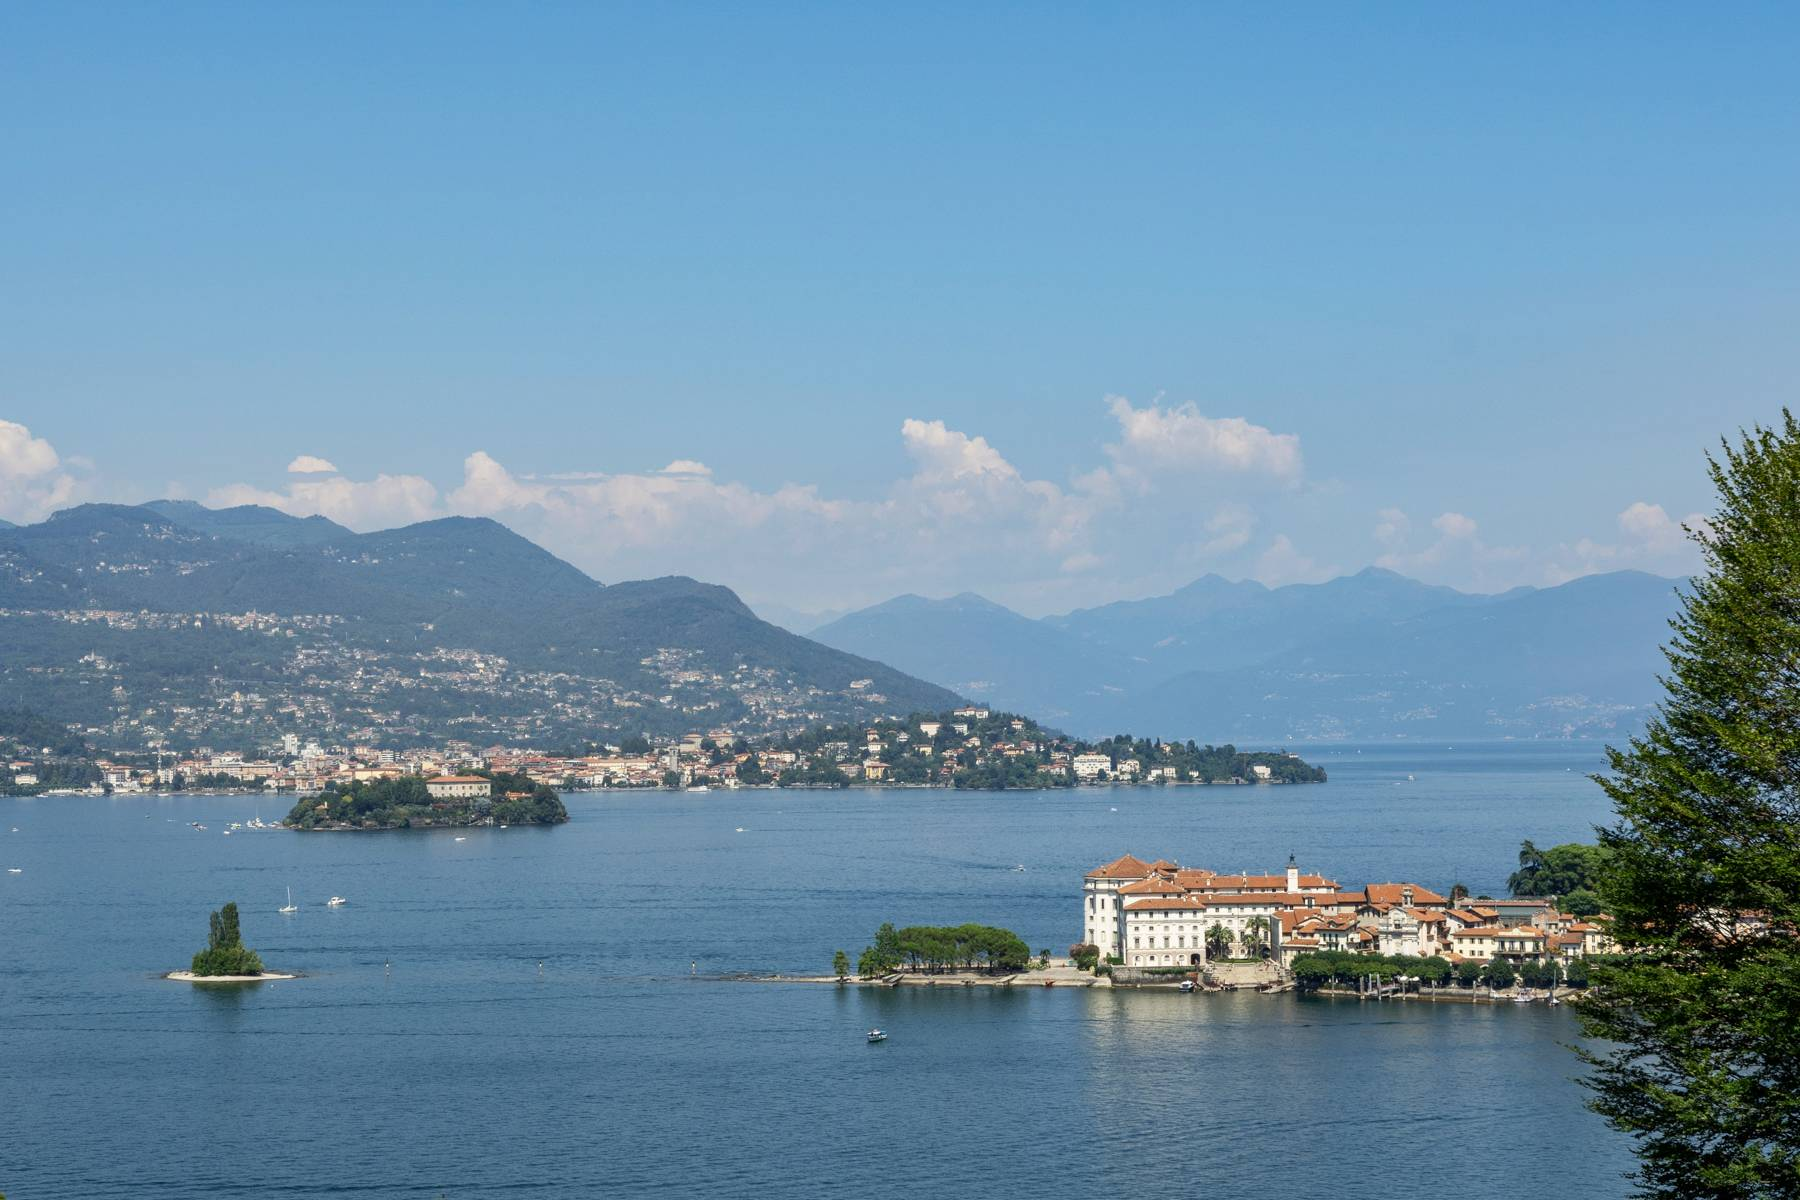 Villa in Vendita a Stresa: 5 locali, 364 mq - Foto 4